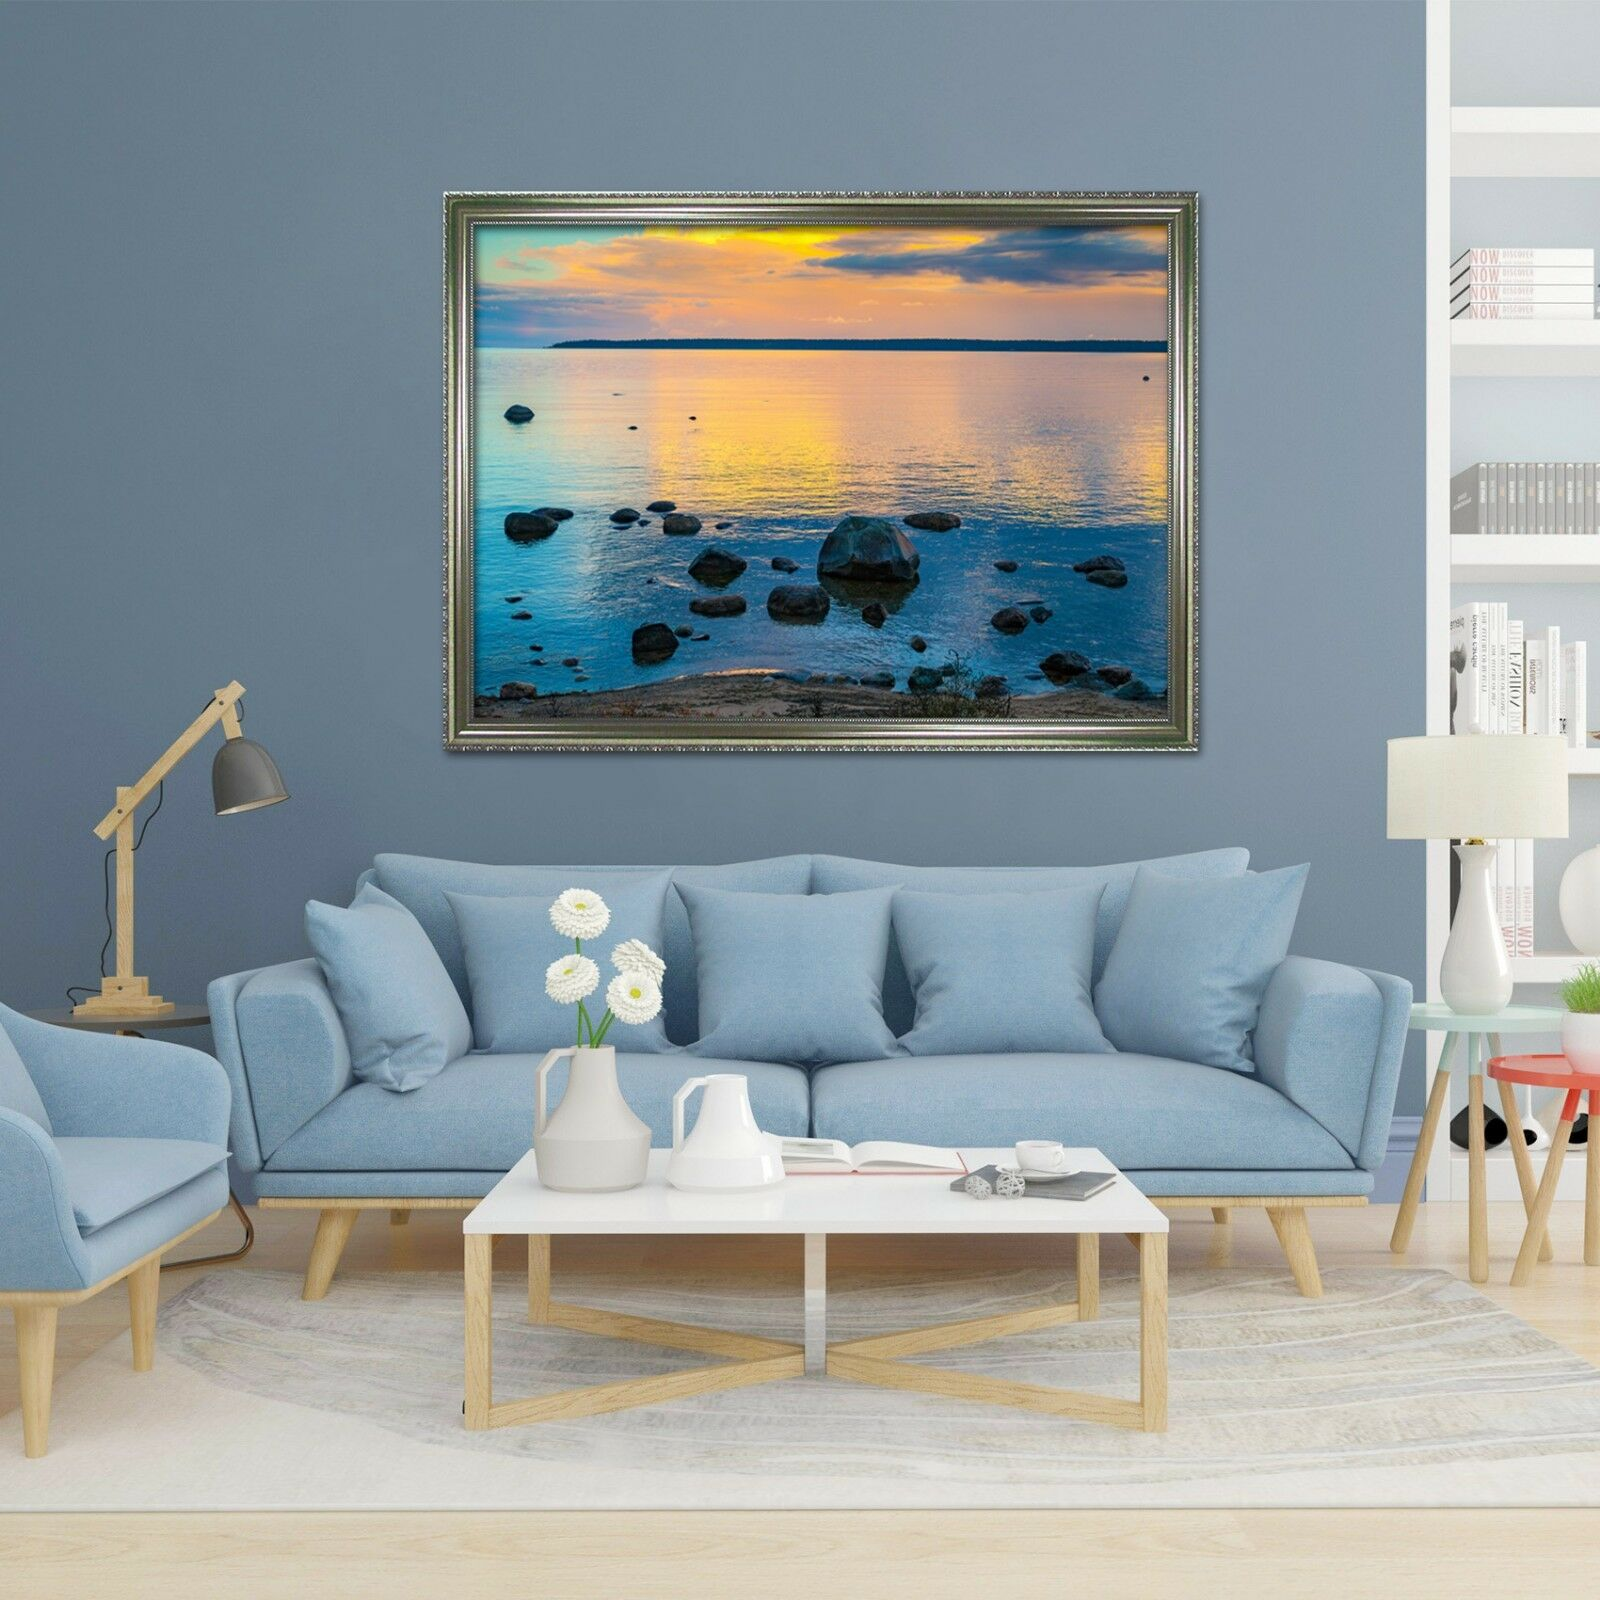 3D Twilight Sea 6 Framed Poster Home Decor Print Painting Art AJ WALLAPER